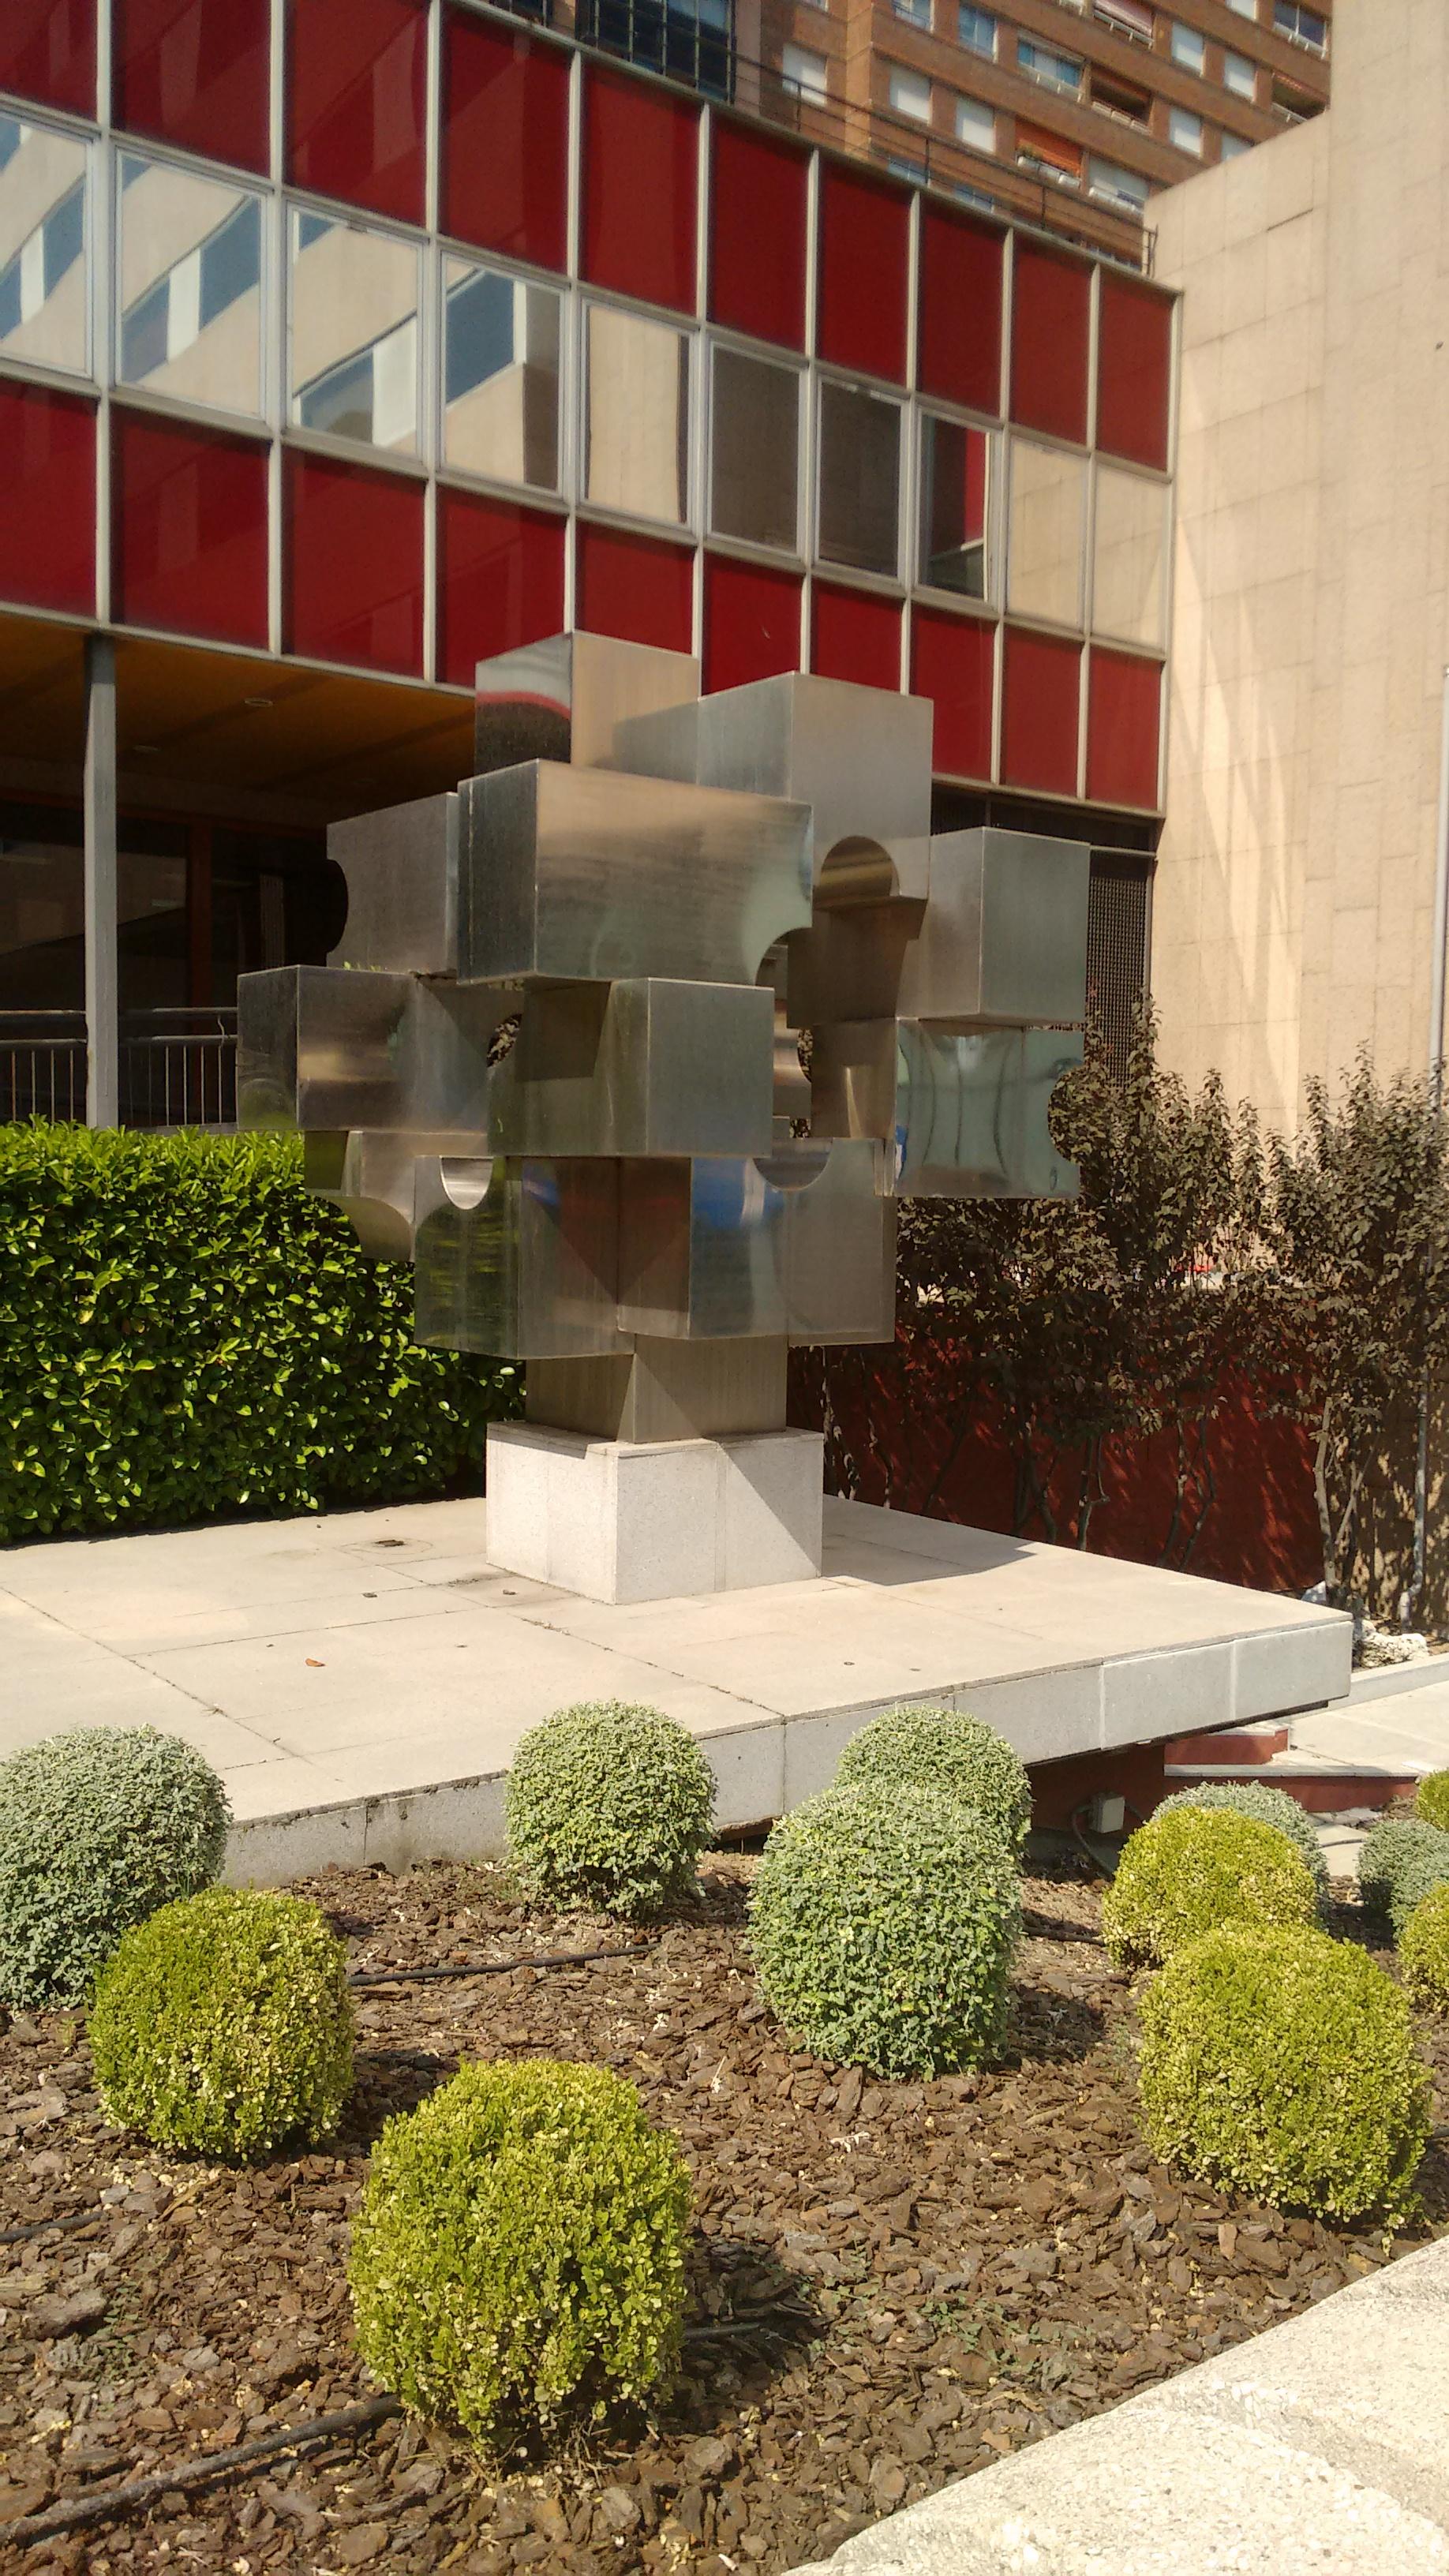 Archivo escultura en la calle orense - Hm calle orense ...